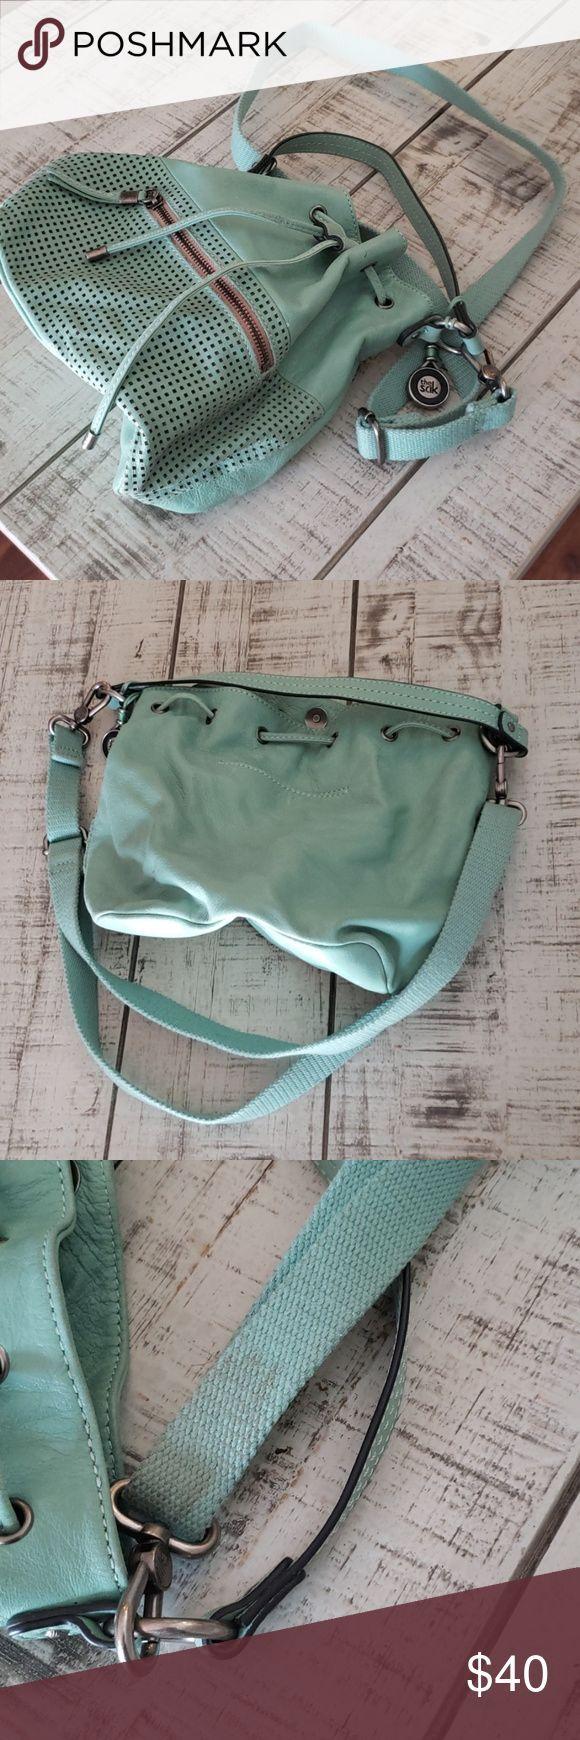 Boho Teal Turquoise lederen tas van The Sak Dit is een gebruikte lederen tas in …